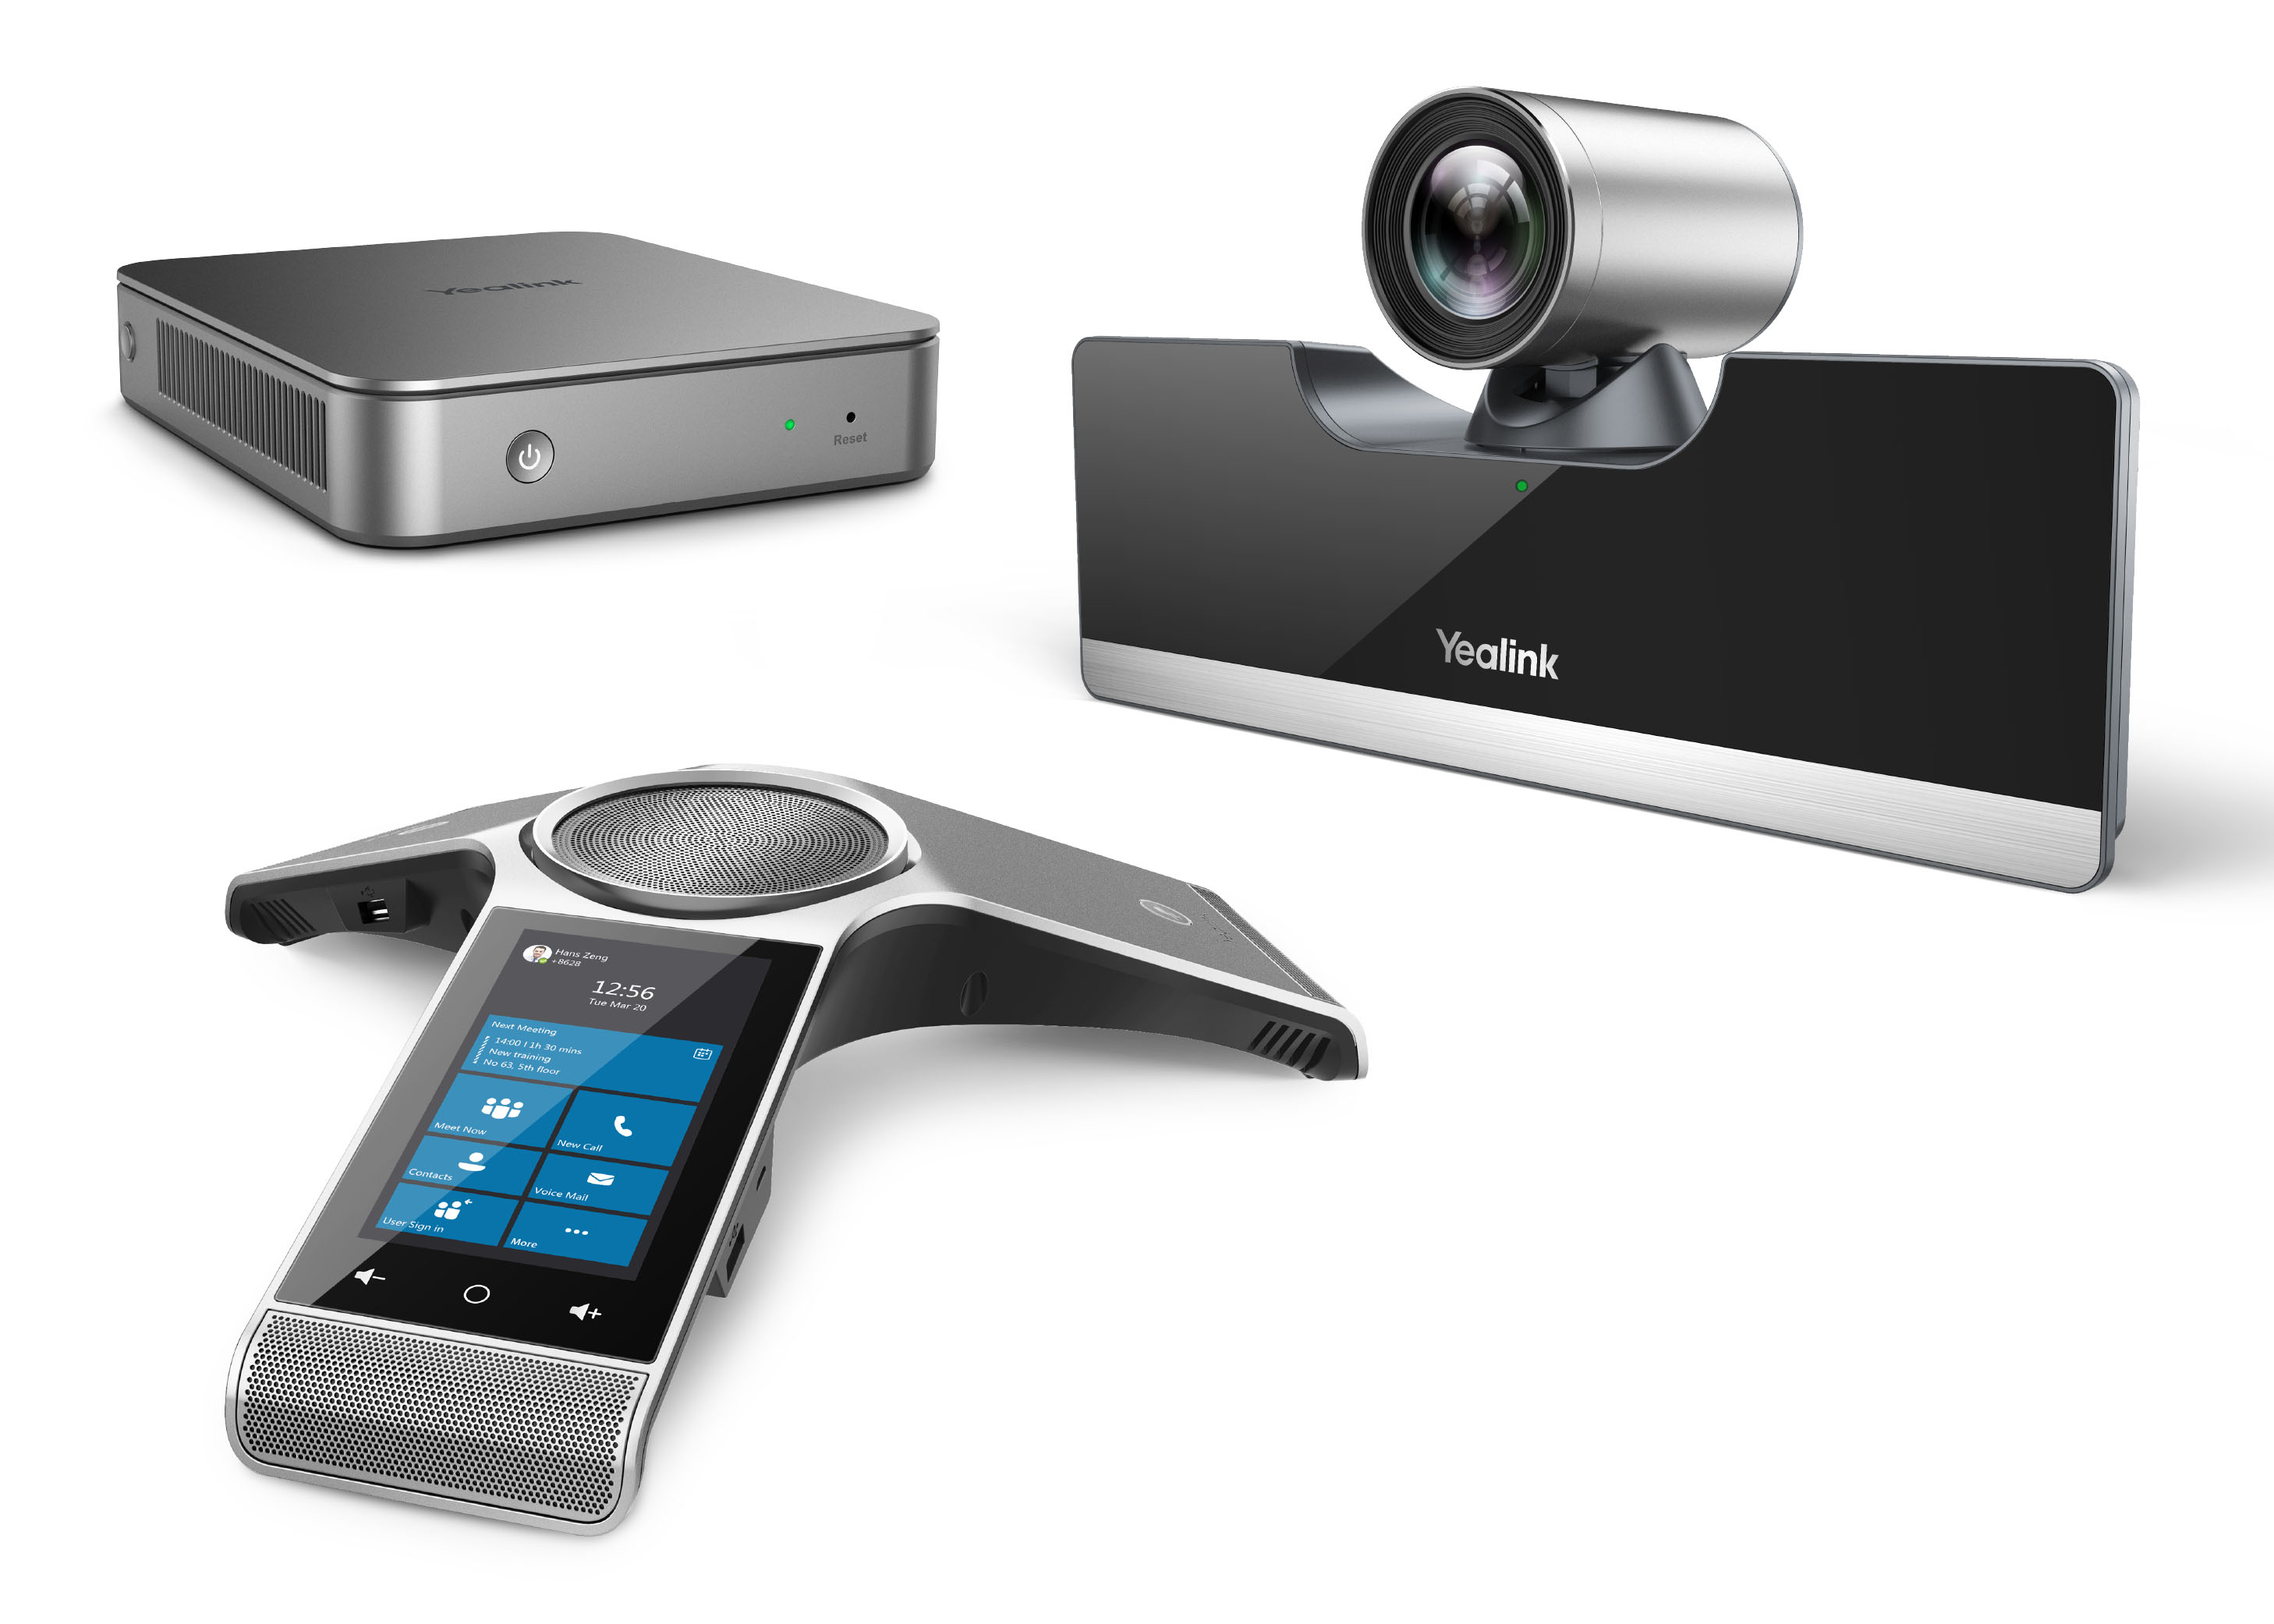 ZVC500 -UVC50 5X optical USB PTZ camera- MCore mini-PC -1x CP960-Zoom-Windows 10 IoT Enterprise OS and license